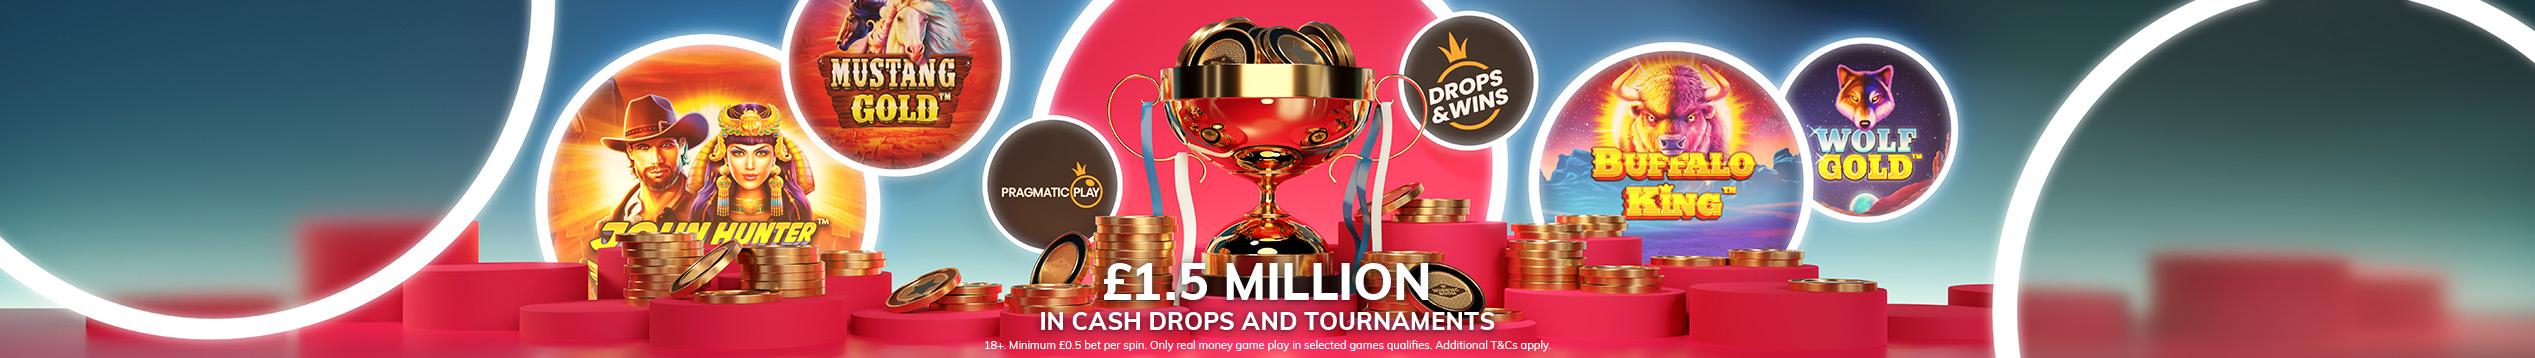 £1,500,000 Prize Pool